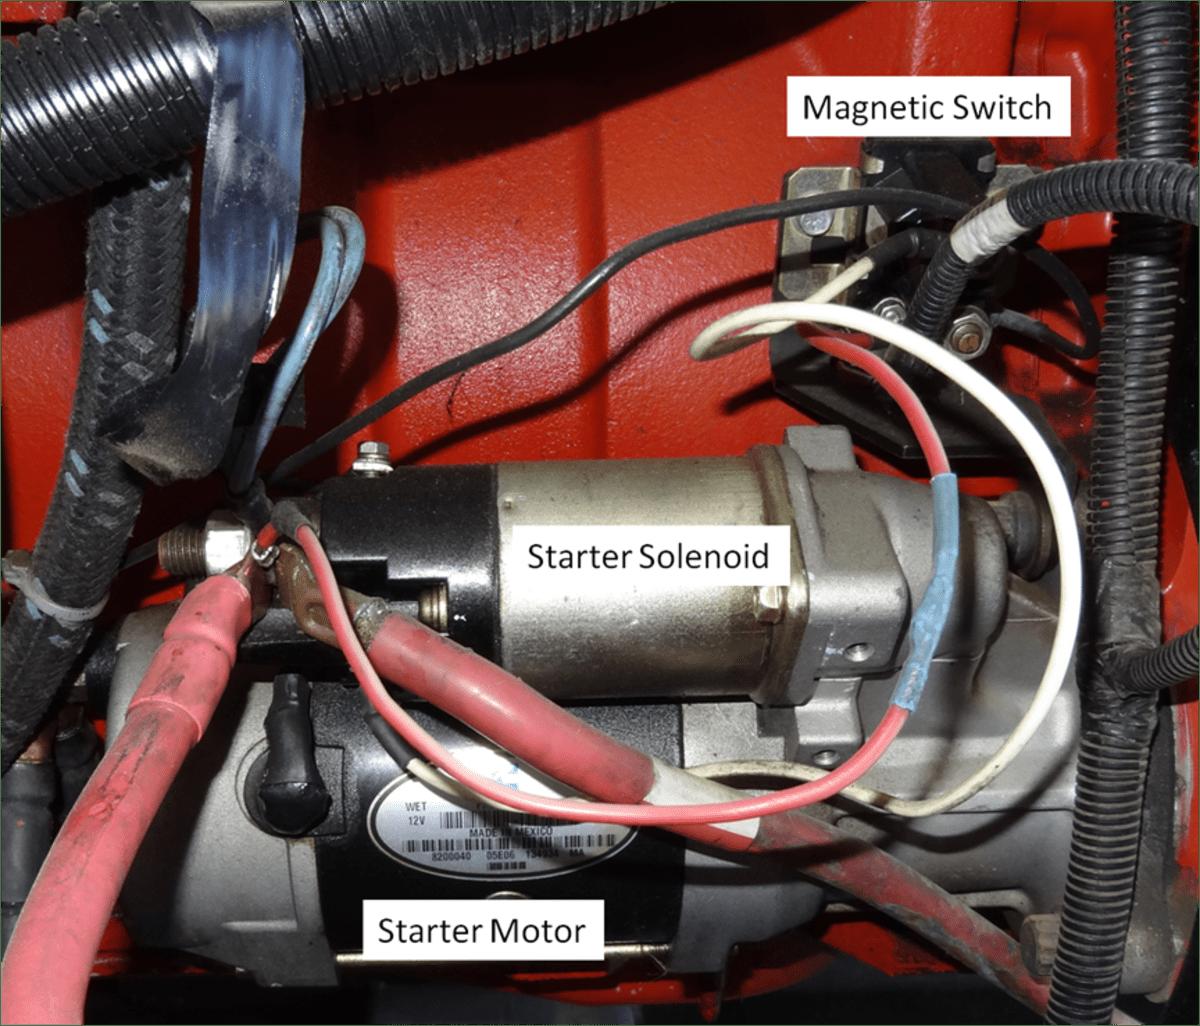 car starter motor wiring diagram fishbone template ppt diy auto service diagnosis and repair axleaddict